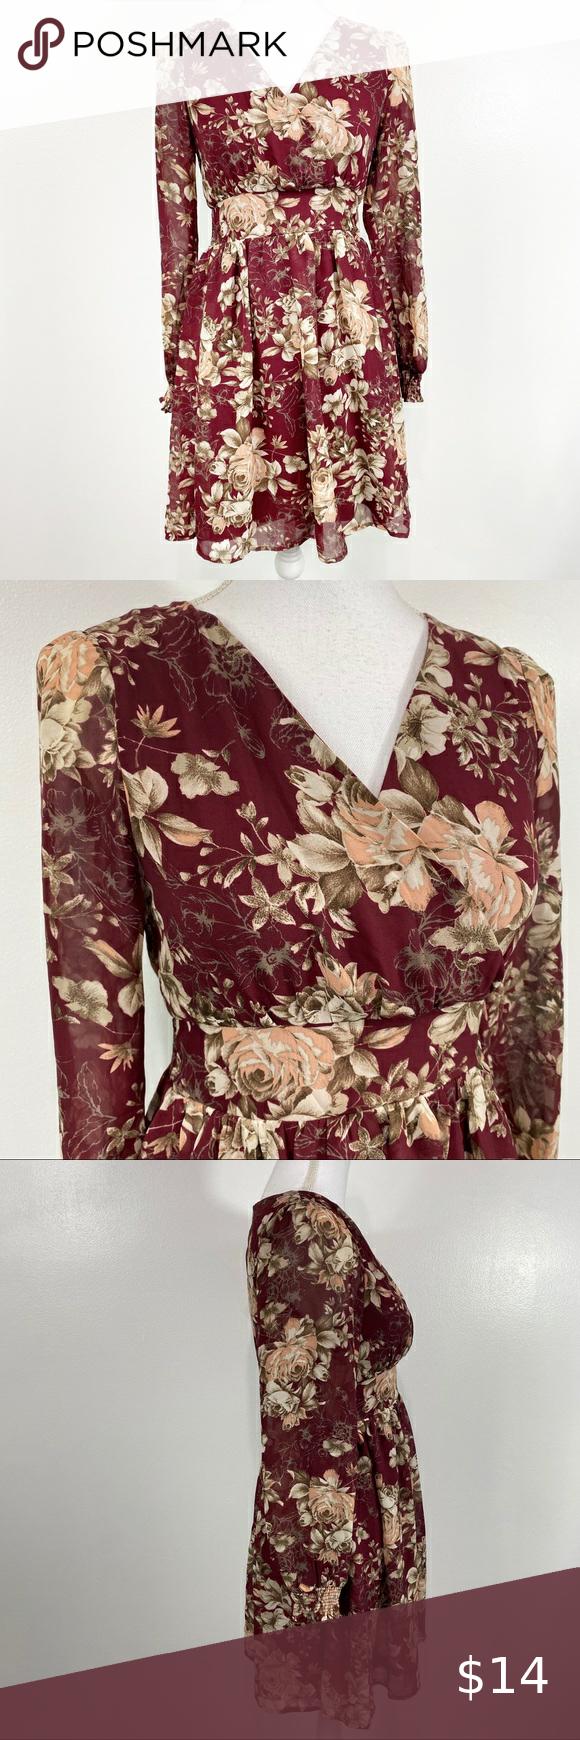 Soieblu Floral Print Long Sleeve Dress Small Soieblu Maroon Purple Red Pink Green Tan Long Sleeve Print Dress Long Sleeve Floral Print Dress Long Sleeve Dress [ 1740 x 580 Pixel ]